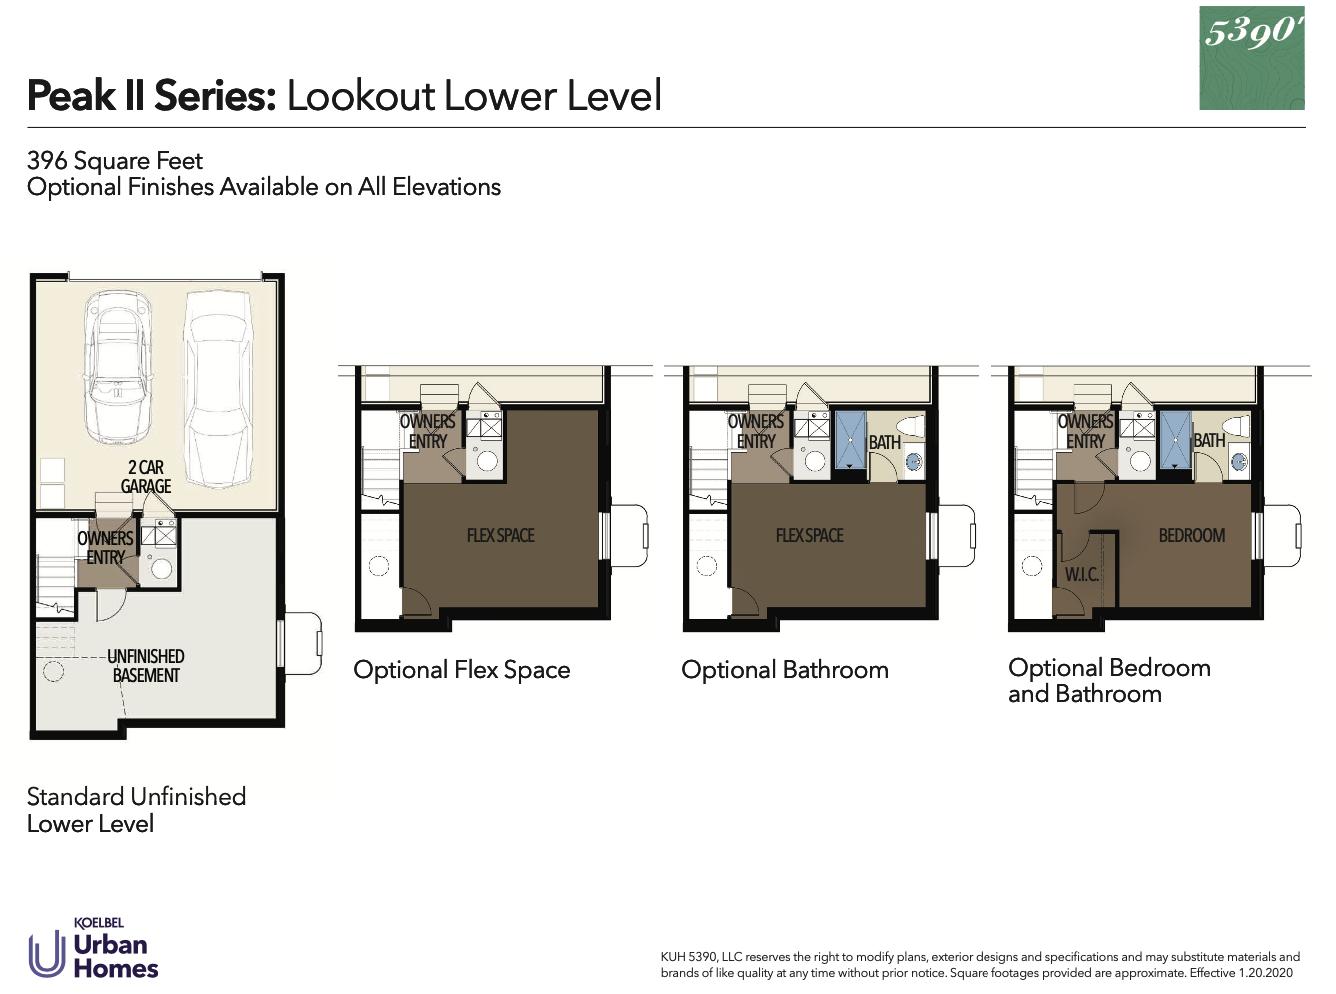 5390' Community by Koelbel in the Berkeley Tennyson Neighborhood Denver New Construction Homes For Sale Peak II Lookout Floorplan1